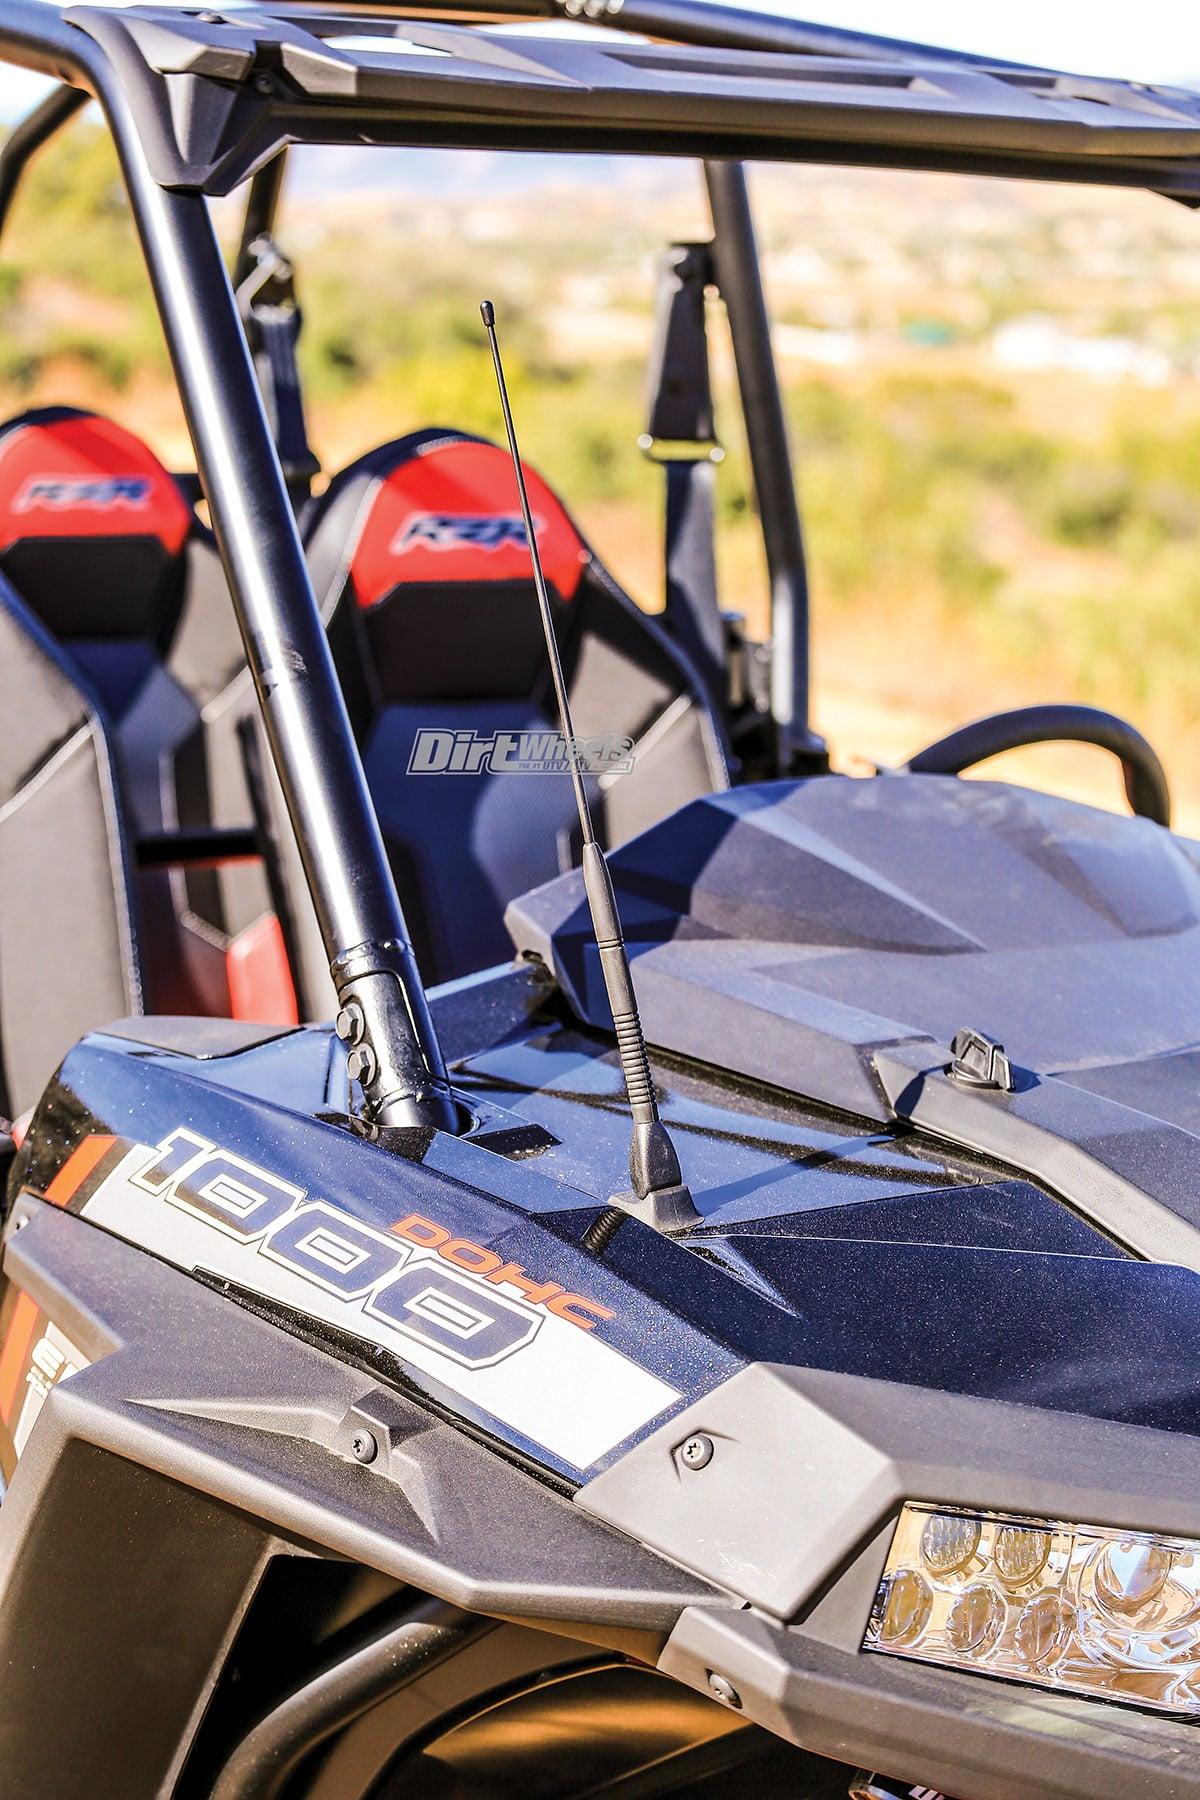 2018 Polaris Rzr Xp 4 1000 Ride Command Edition Dirt